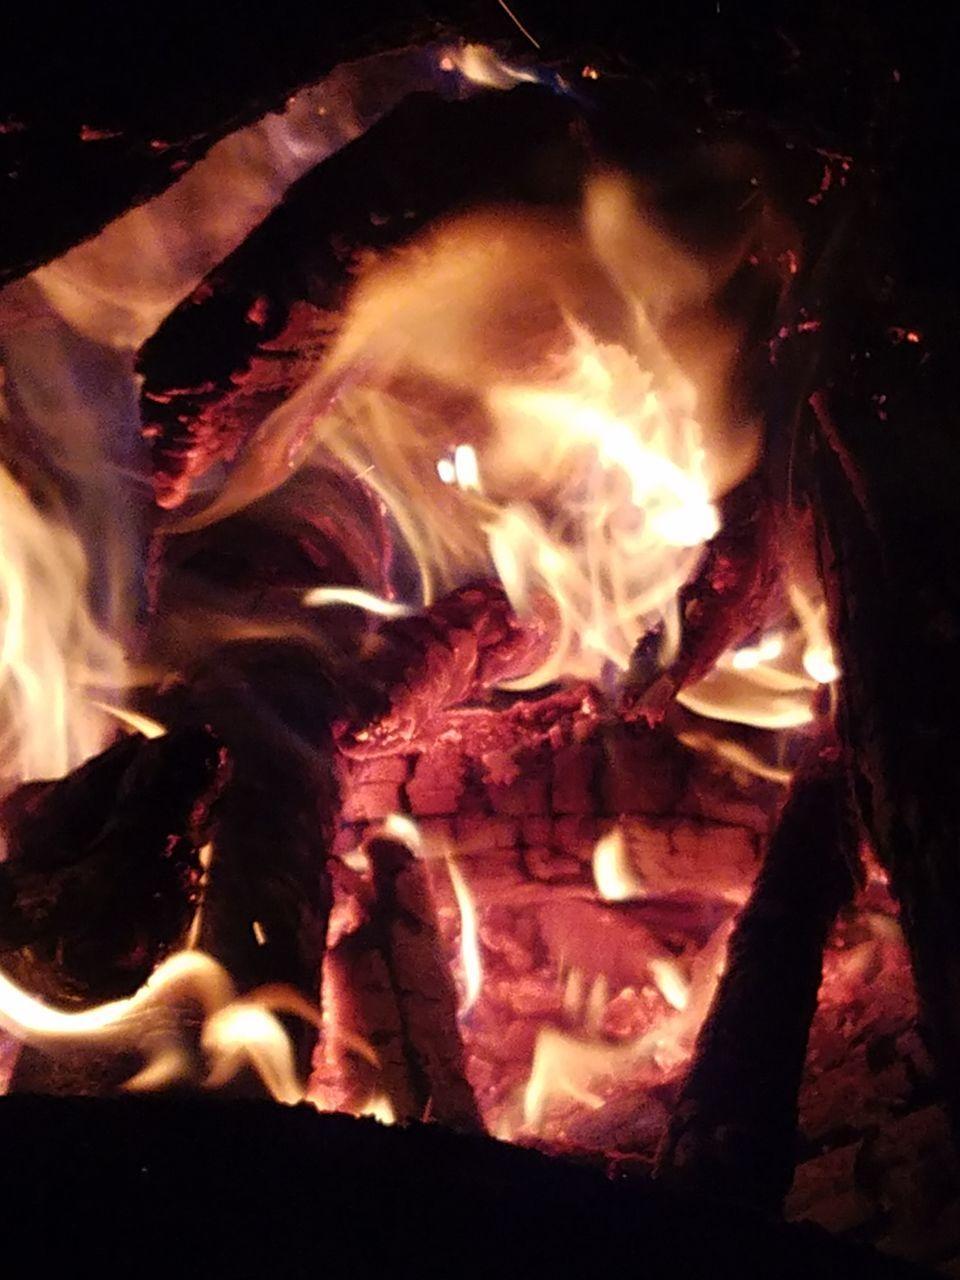 burning, night, flame, heat - temperature, no people, bonfire, outdoors, nature, close-up